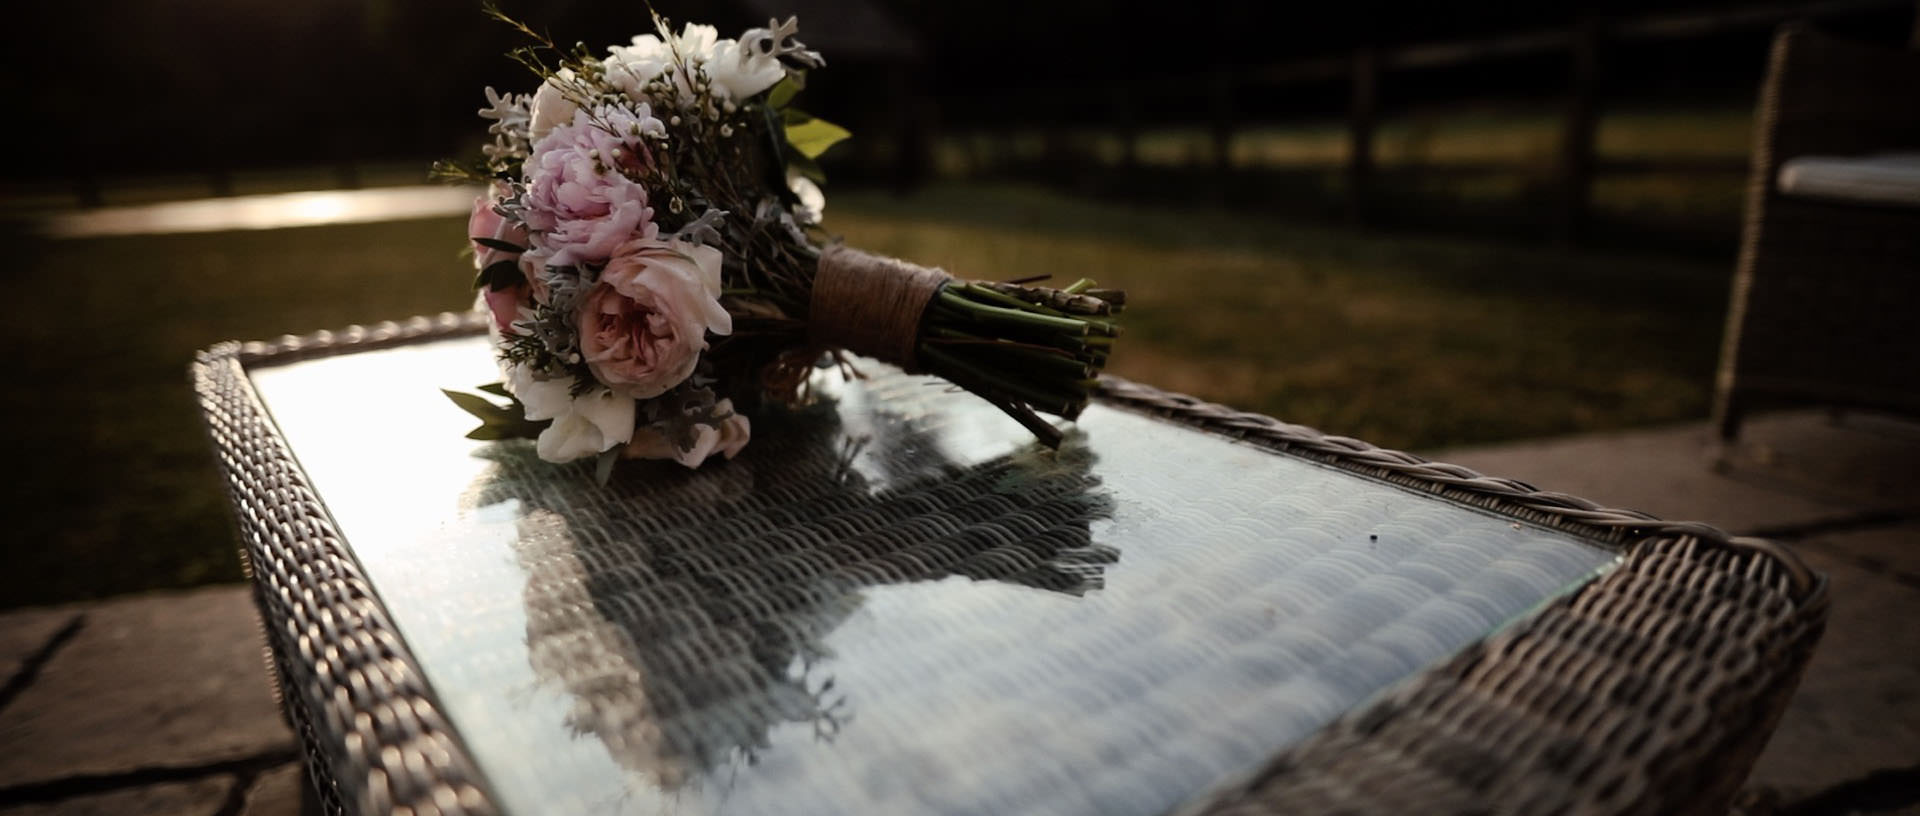 Hyde Barn Colswolds Wedding Verity-Jade & Kai 31 Cropped.jpg